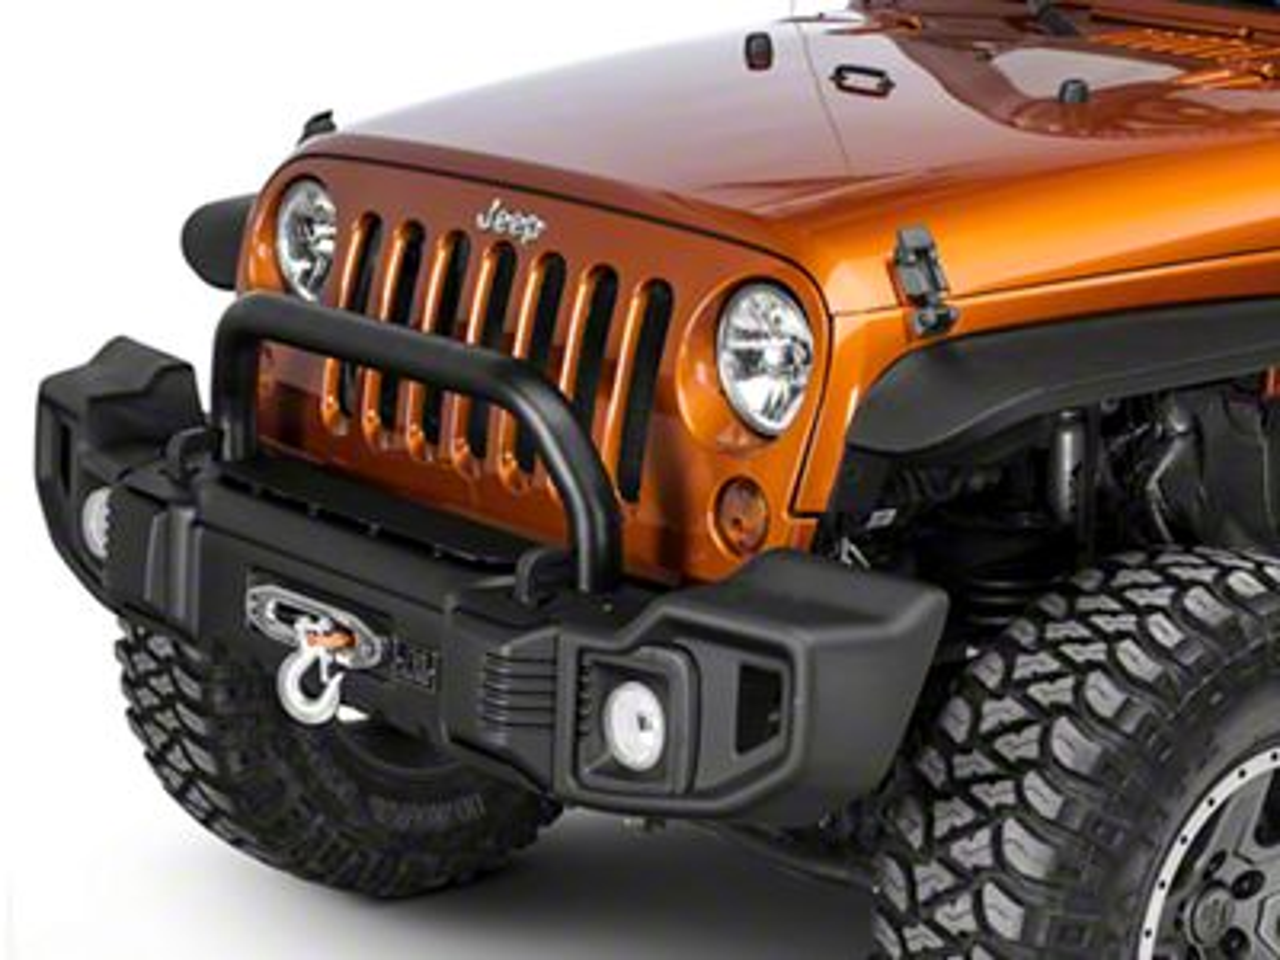 Rugged Ridge Spartacus Front Bumper Kit w/Overrider - Satin Black (07-18 Jeep Wrangler JK)